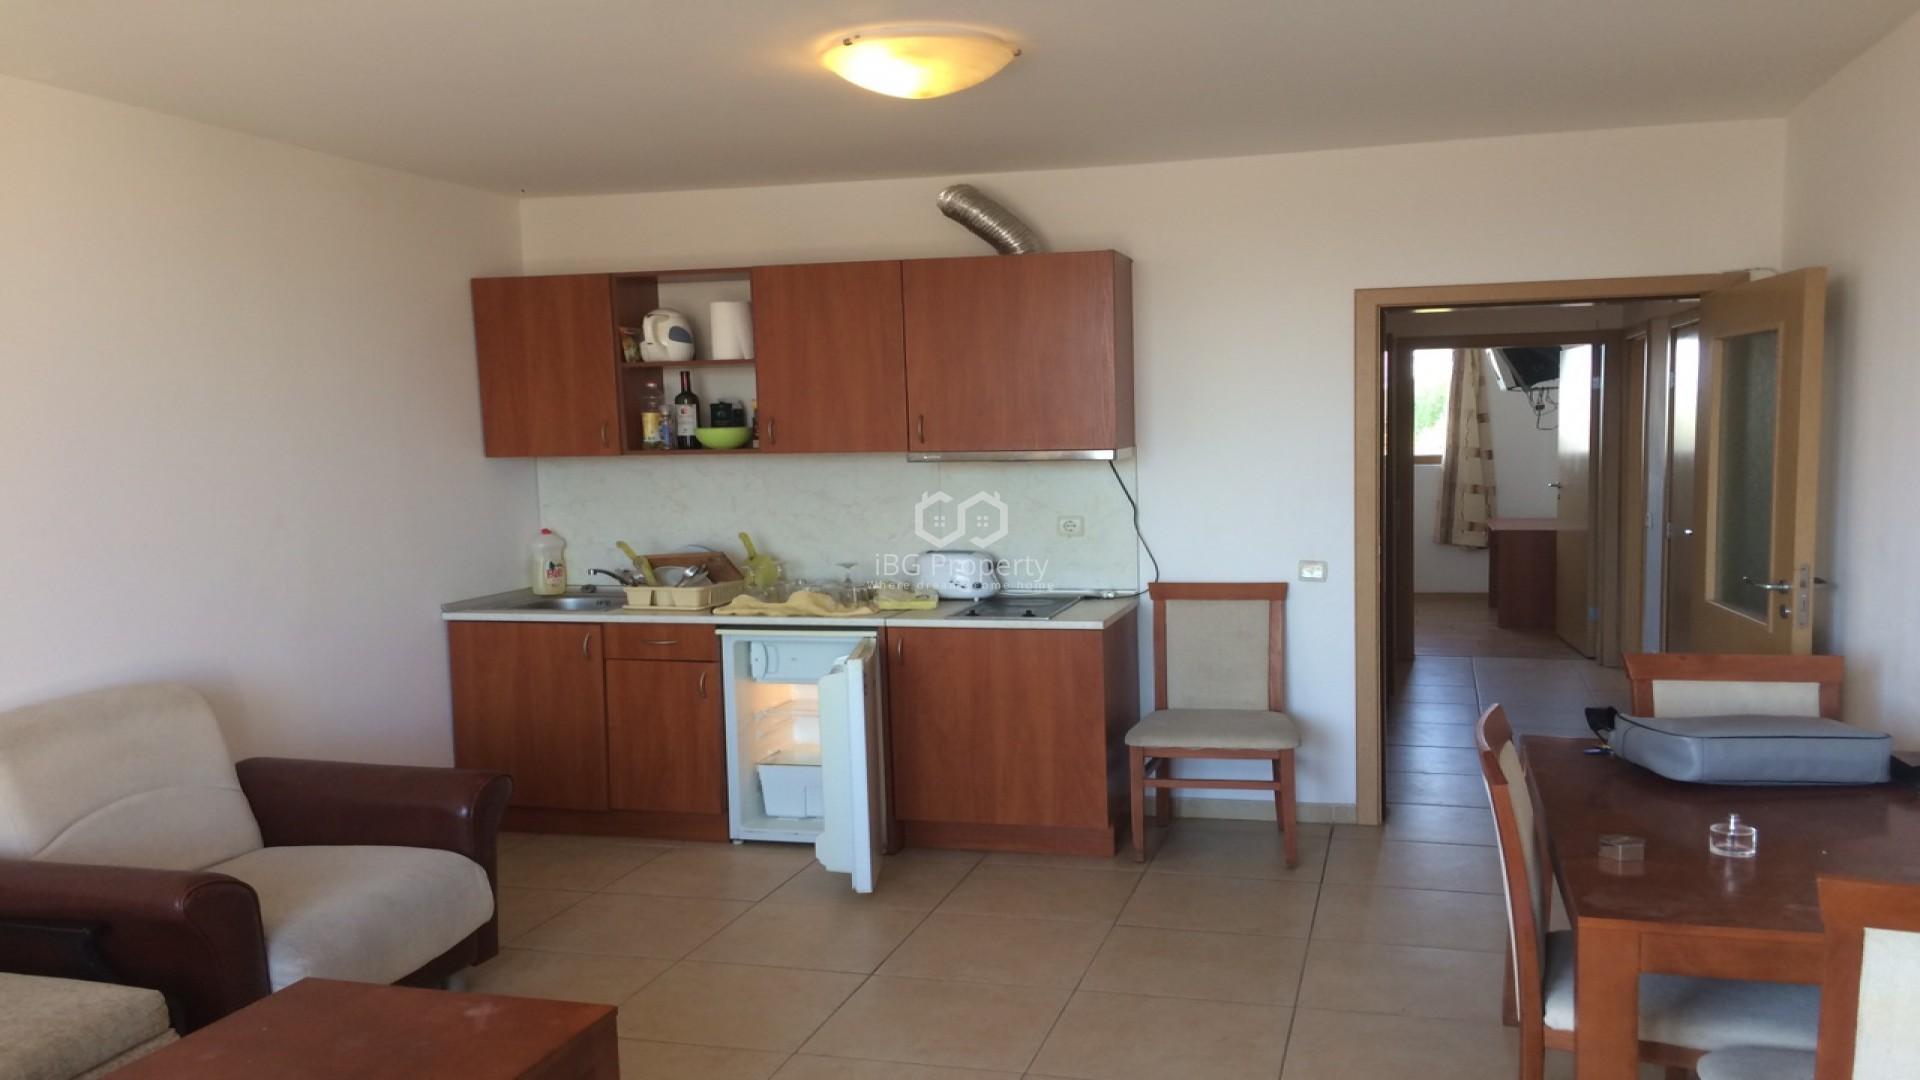 Tристаен апартамент Слънчев Бряг 110 m2